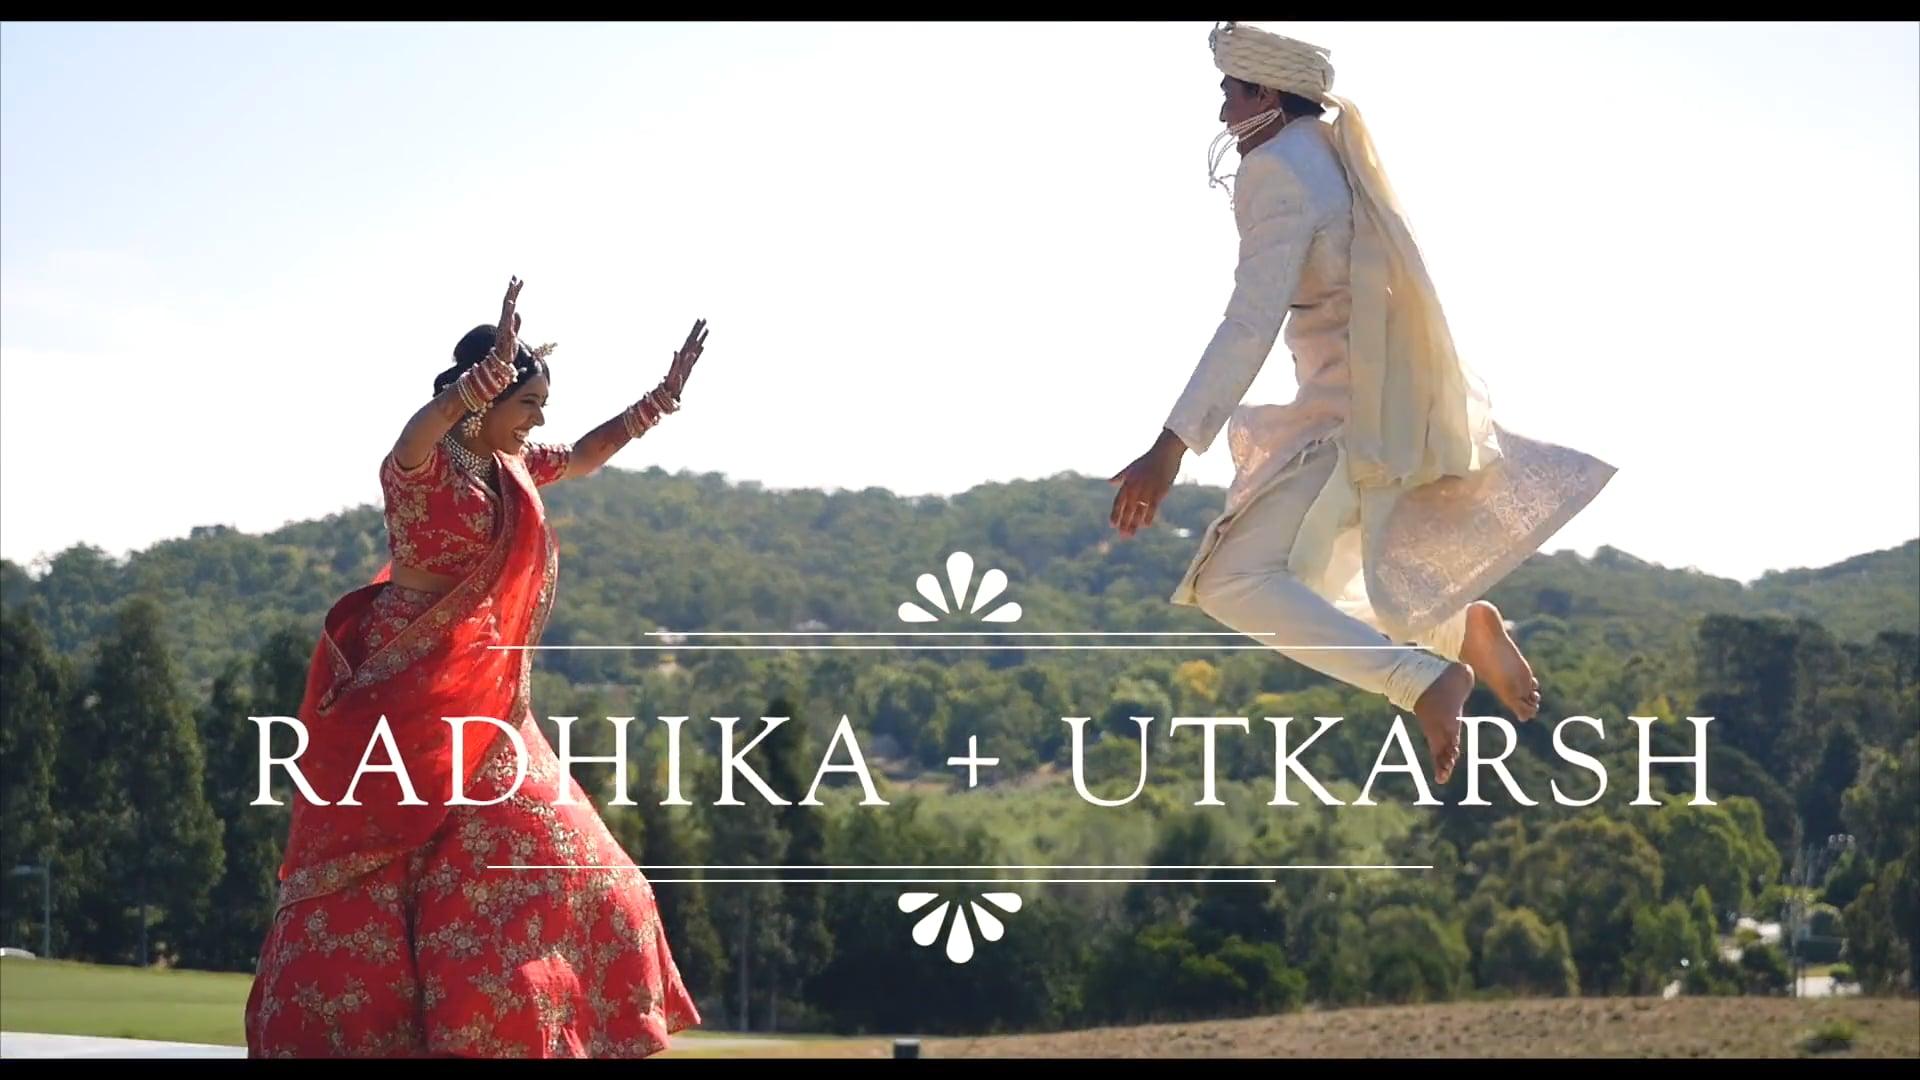 Radhika + Utkarsh - Unstoppable Force of Fun - The Wedding Film // Sansa x Ferndara